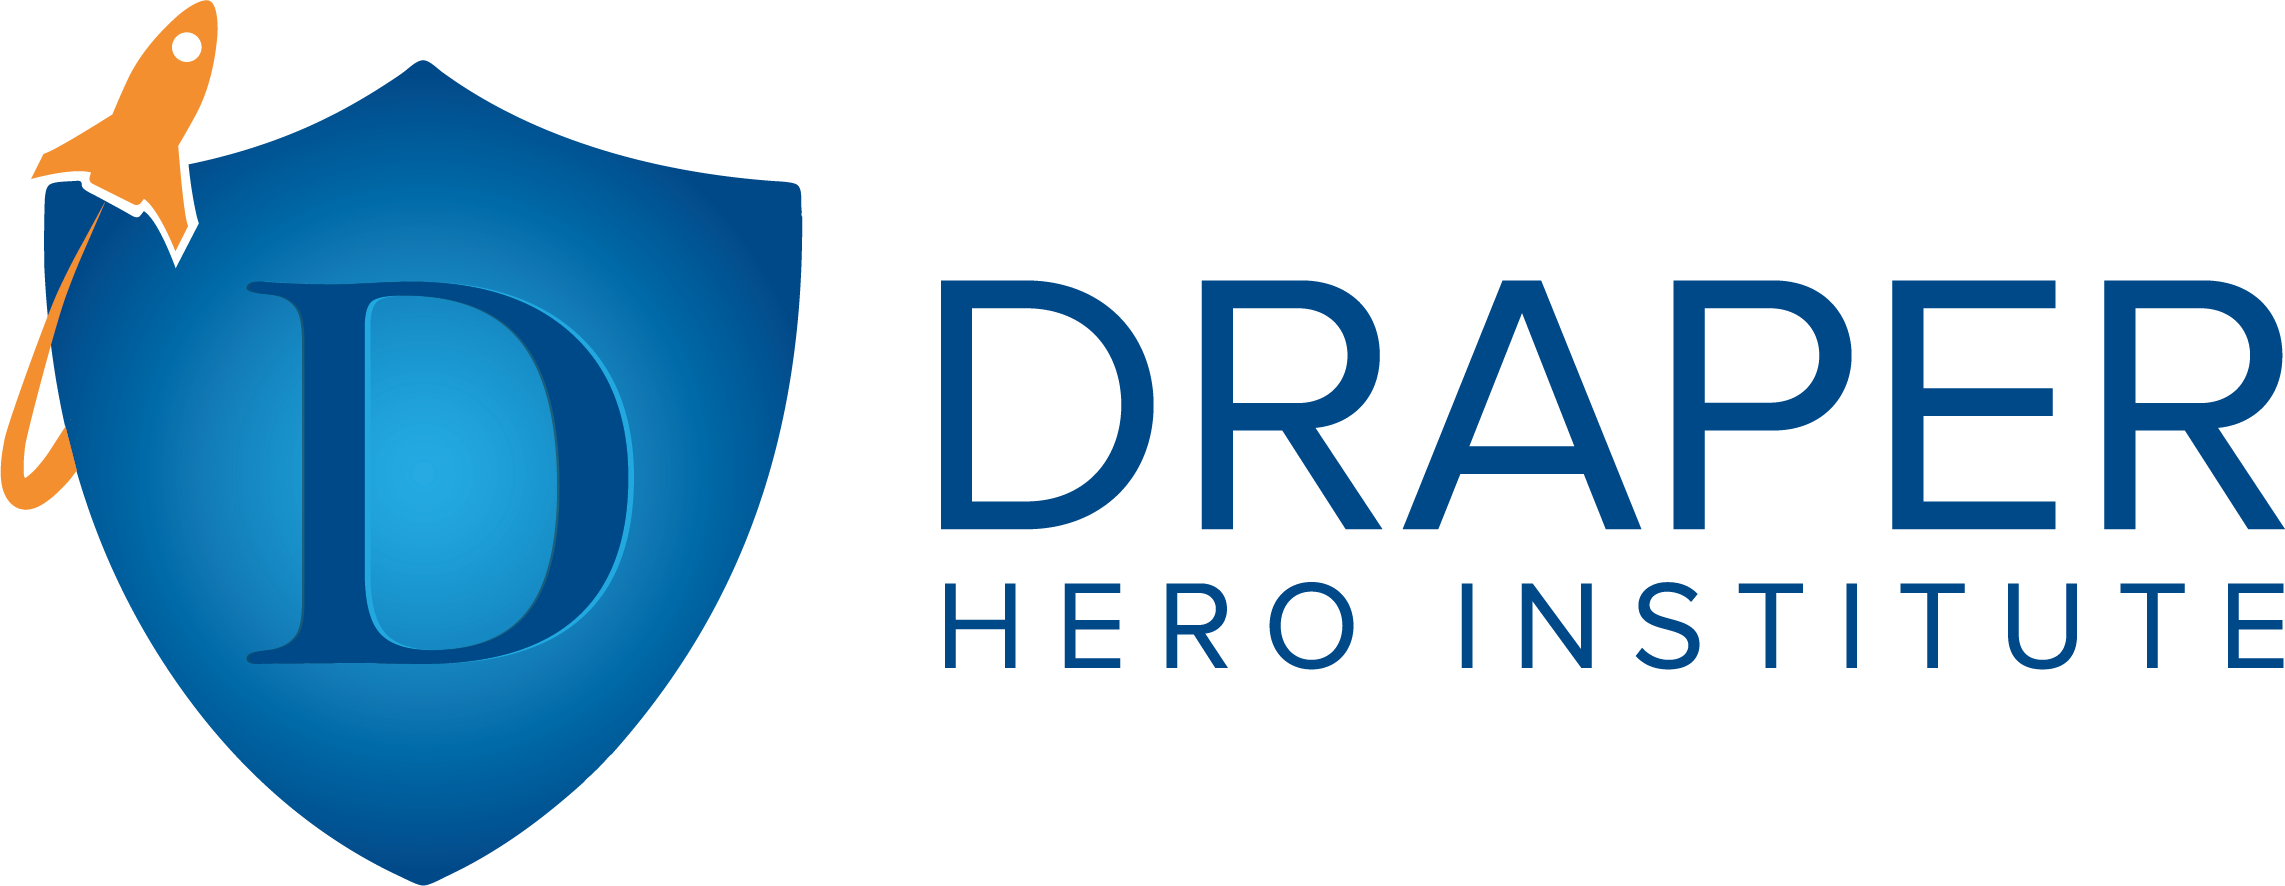 Draper Hero Institute logo full color